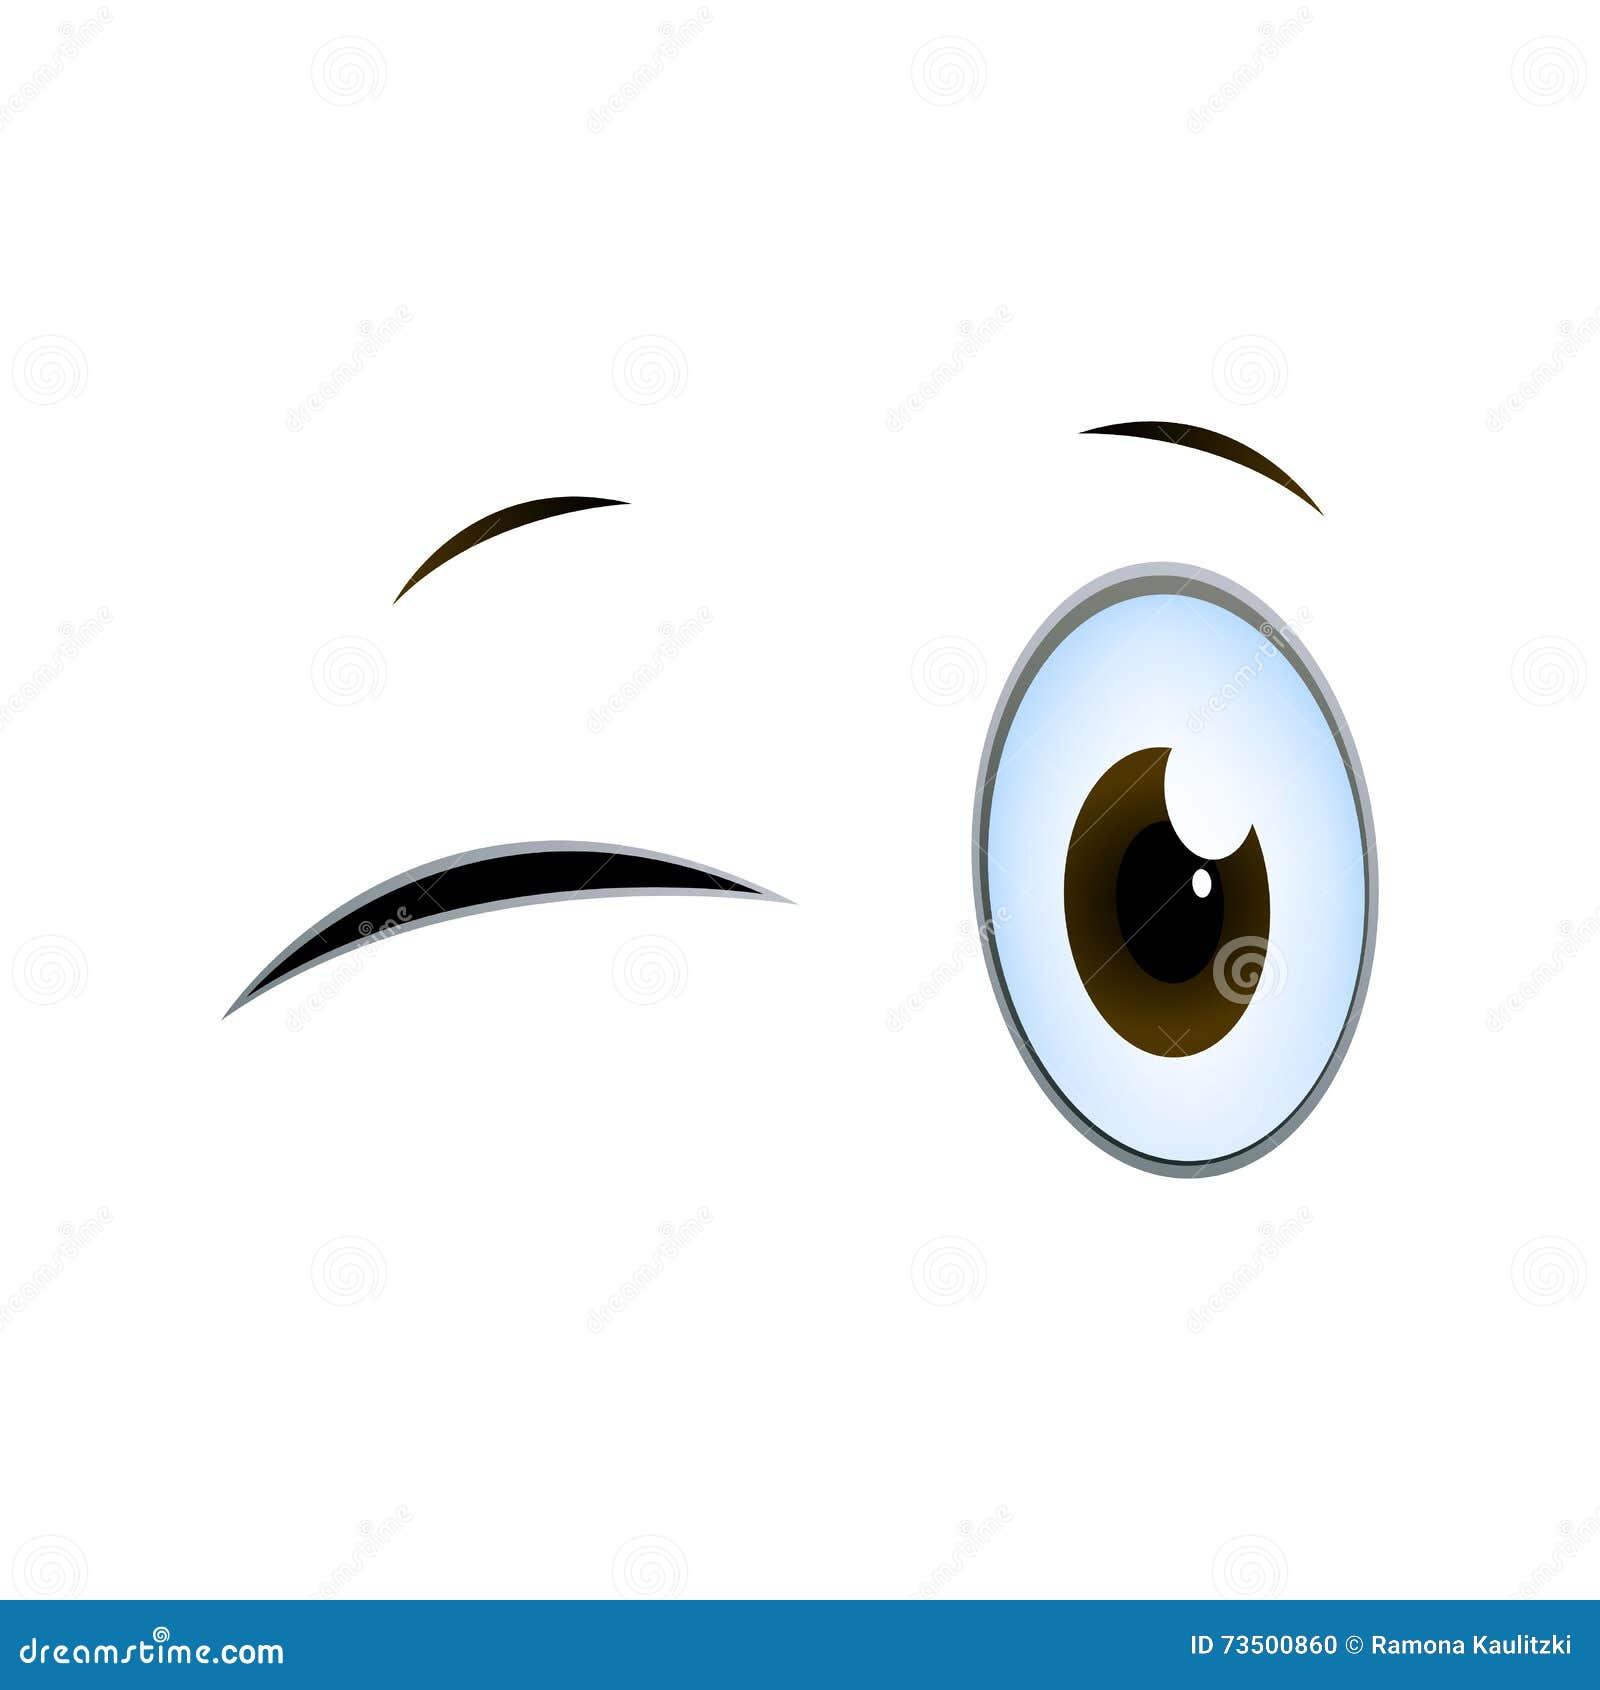 Olhos Dos Desenhos Animados Piscar Ilustracao Stock Ilustracao De Olhos Animados 73500860